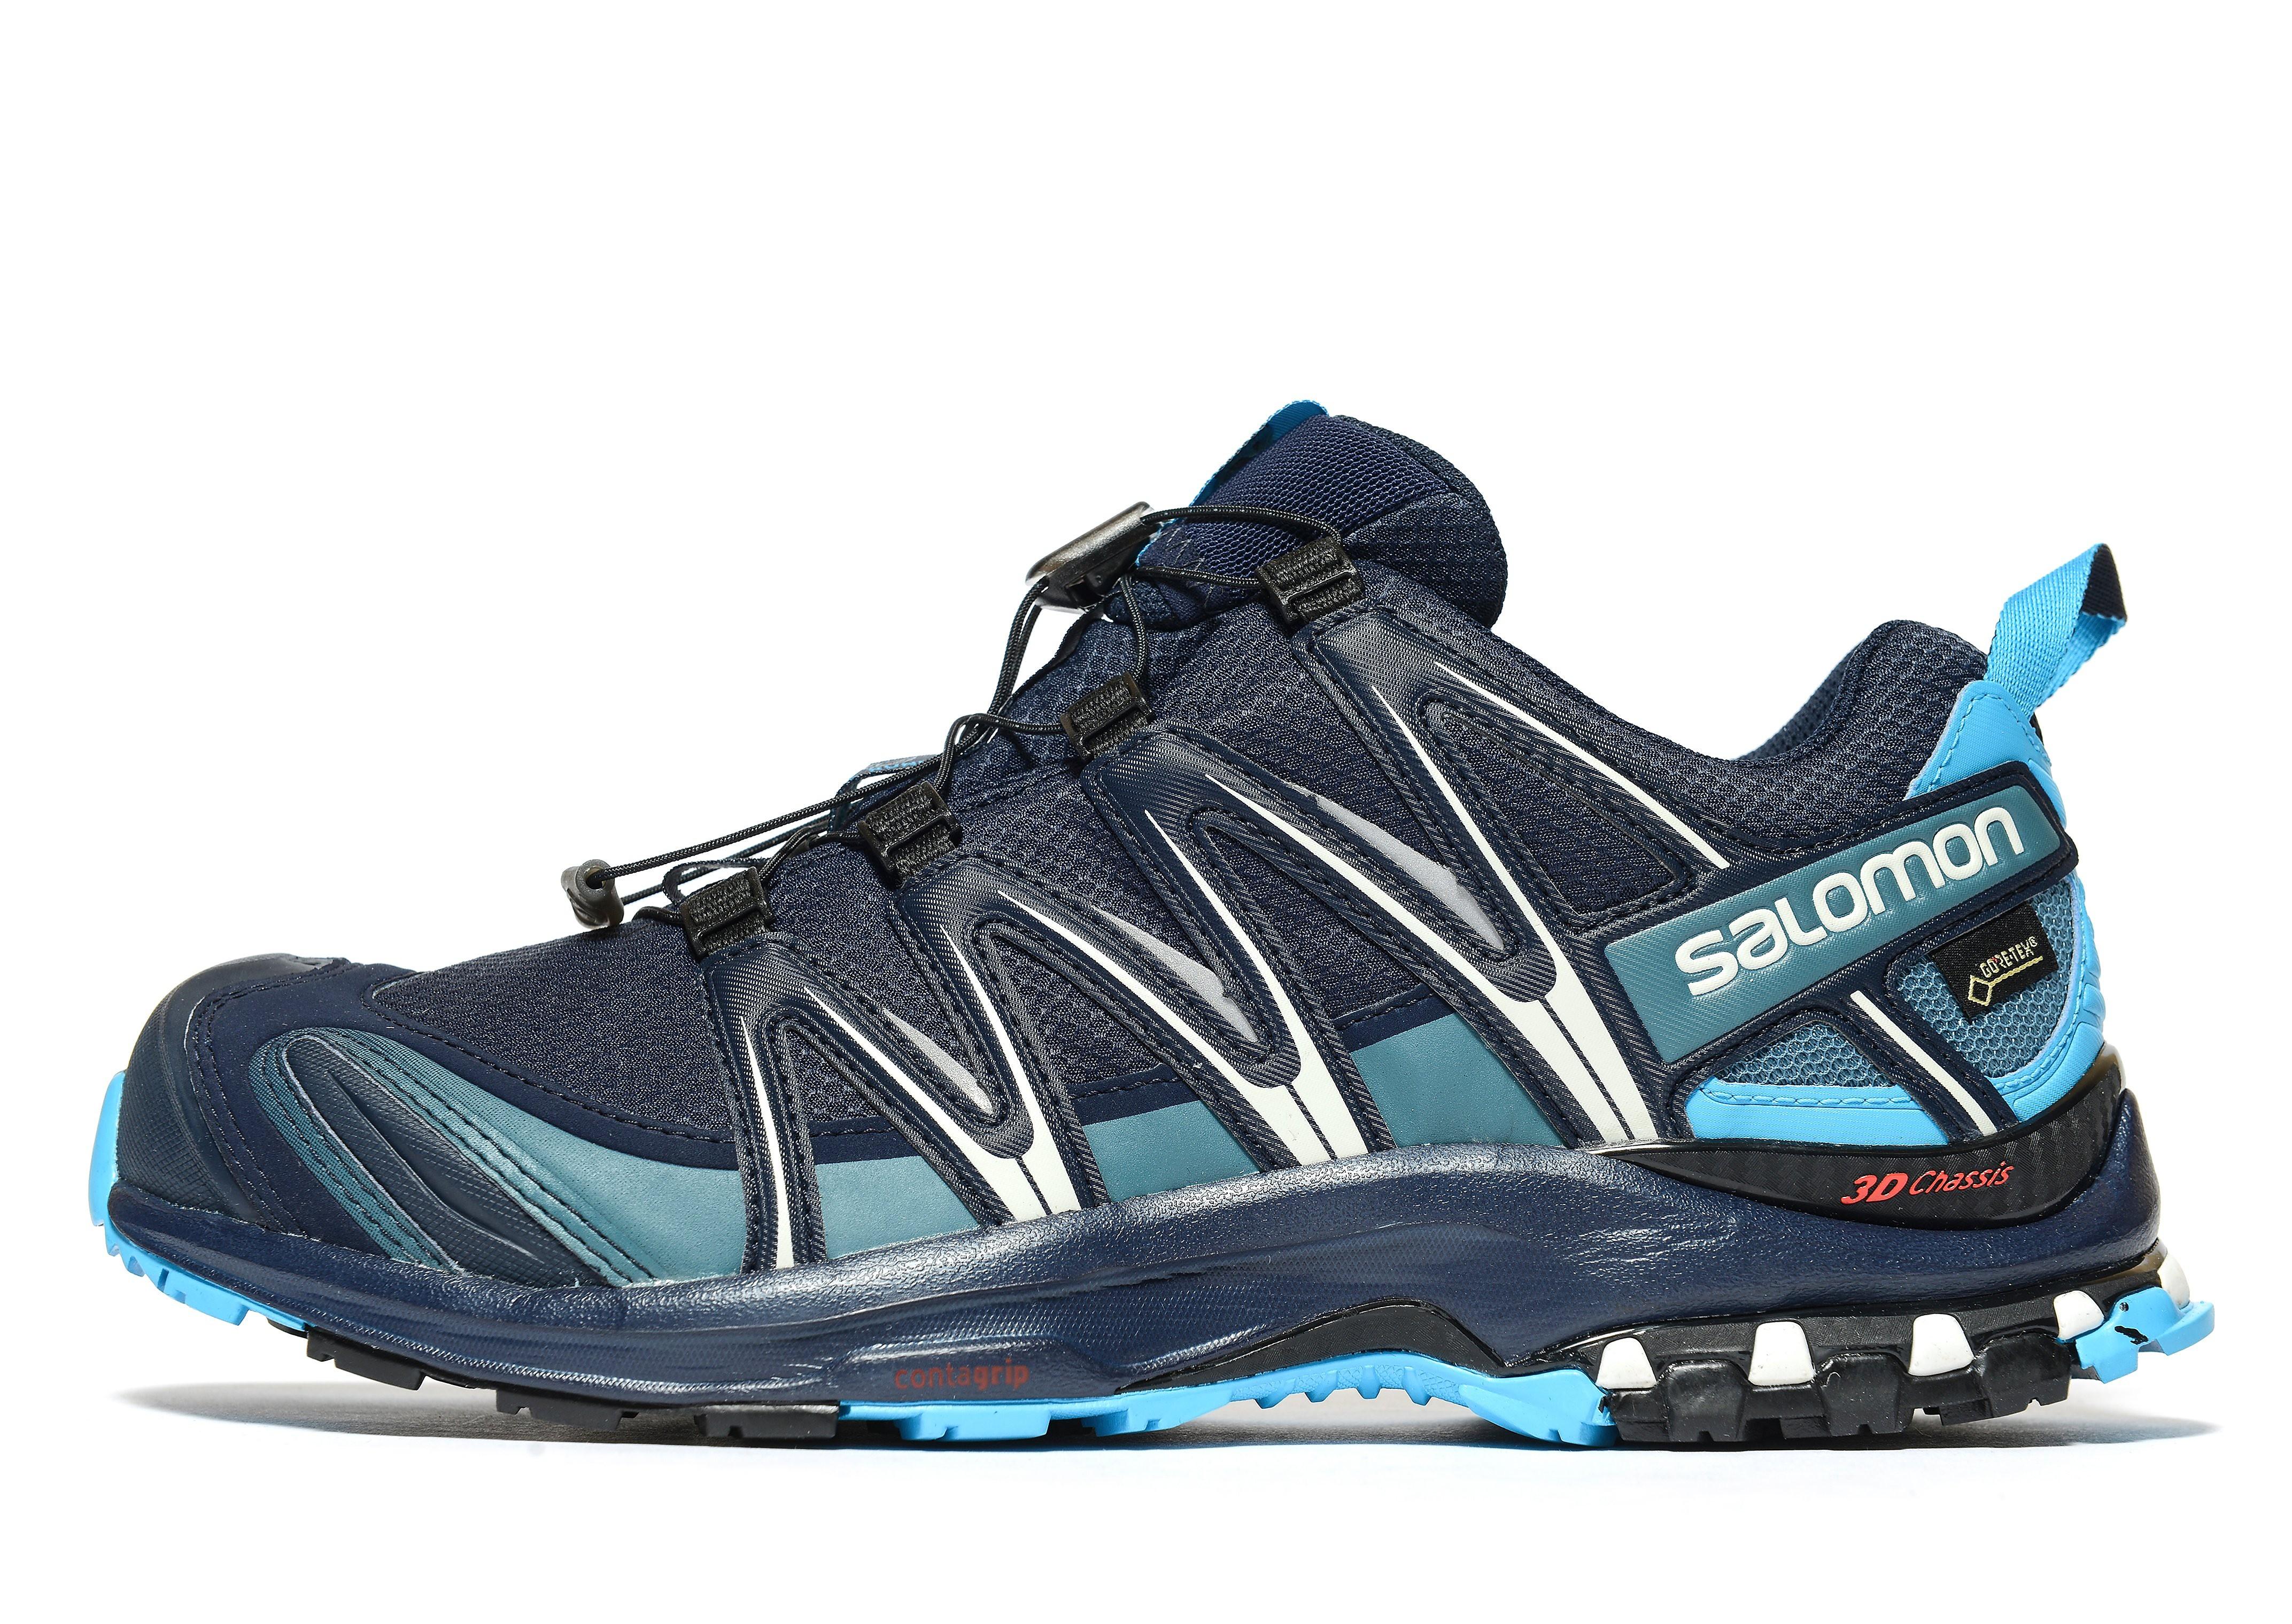 Salomon XA Pro 3D GTX Trail Running Shoes